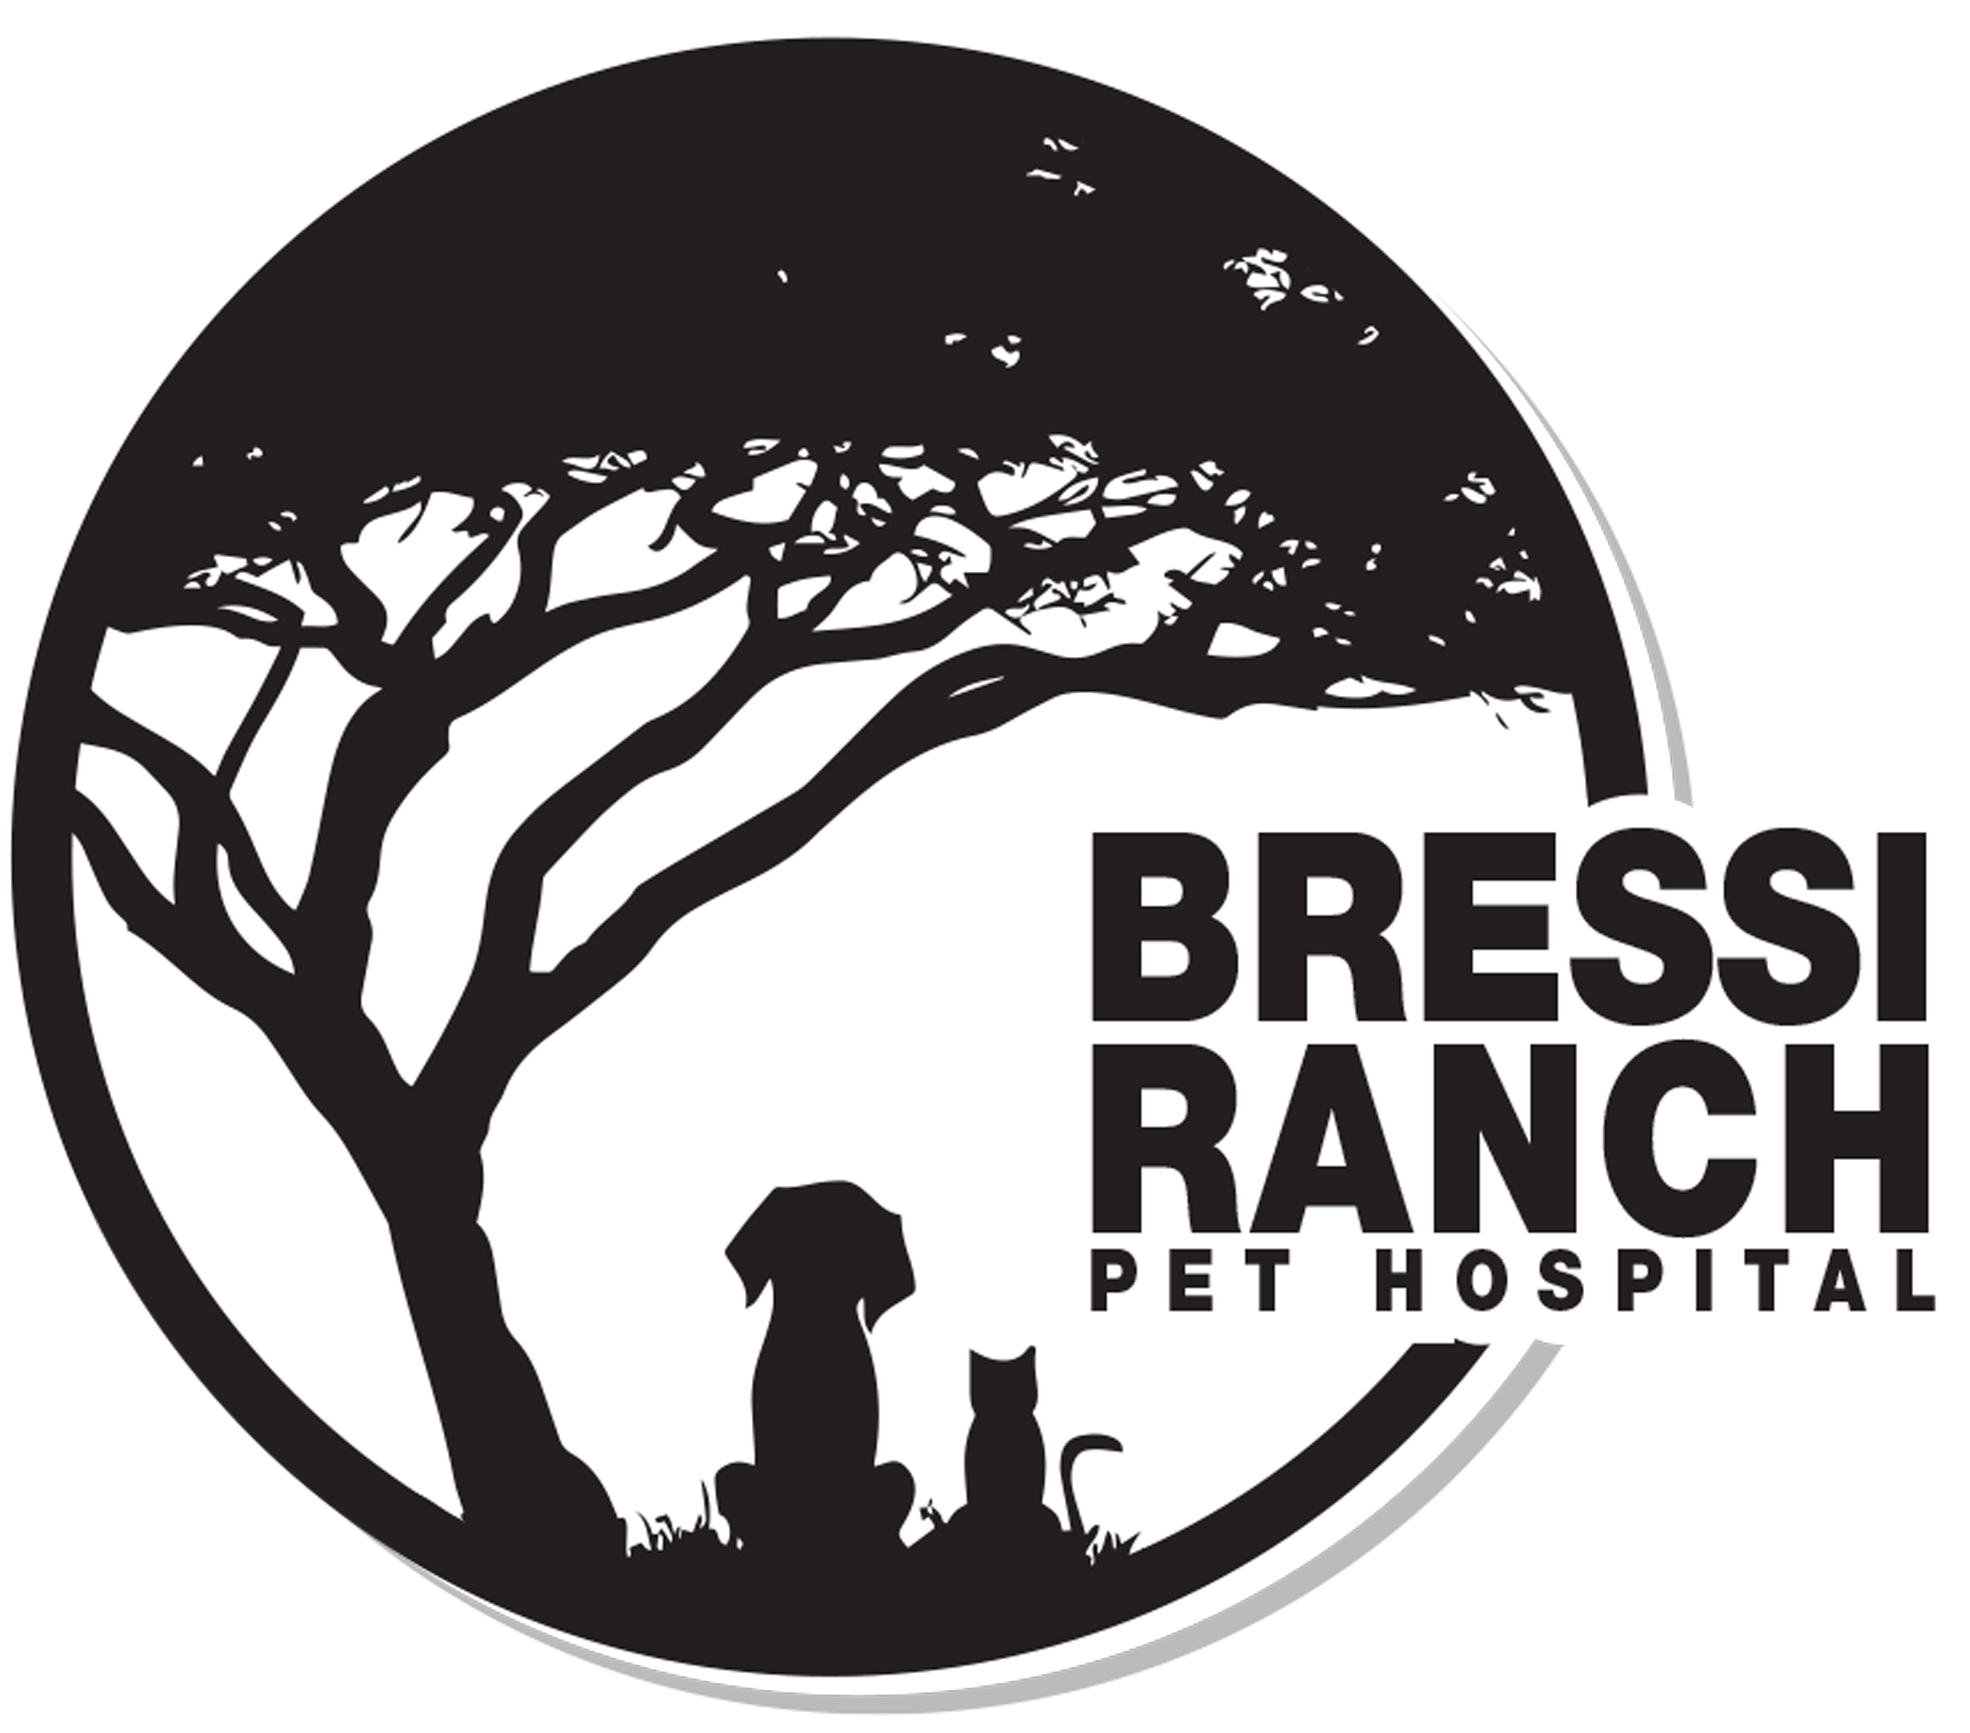 Bressi Ranch Pet Hospital